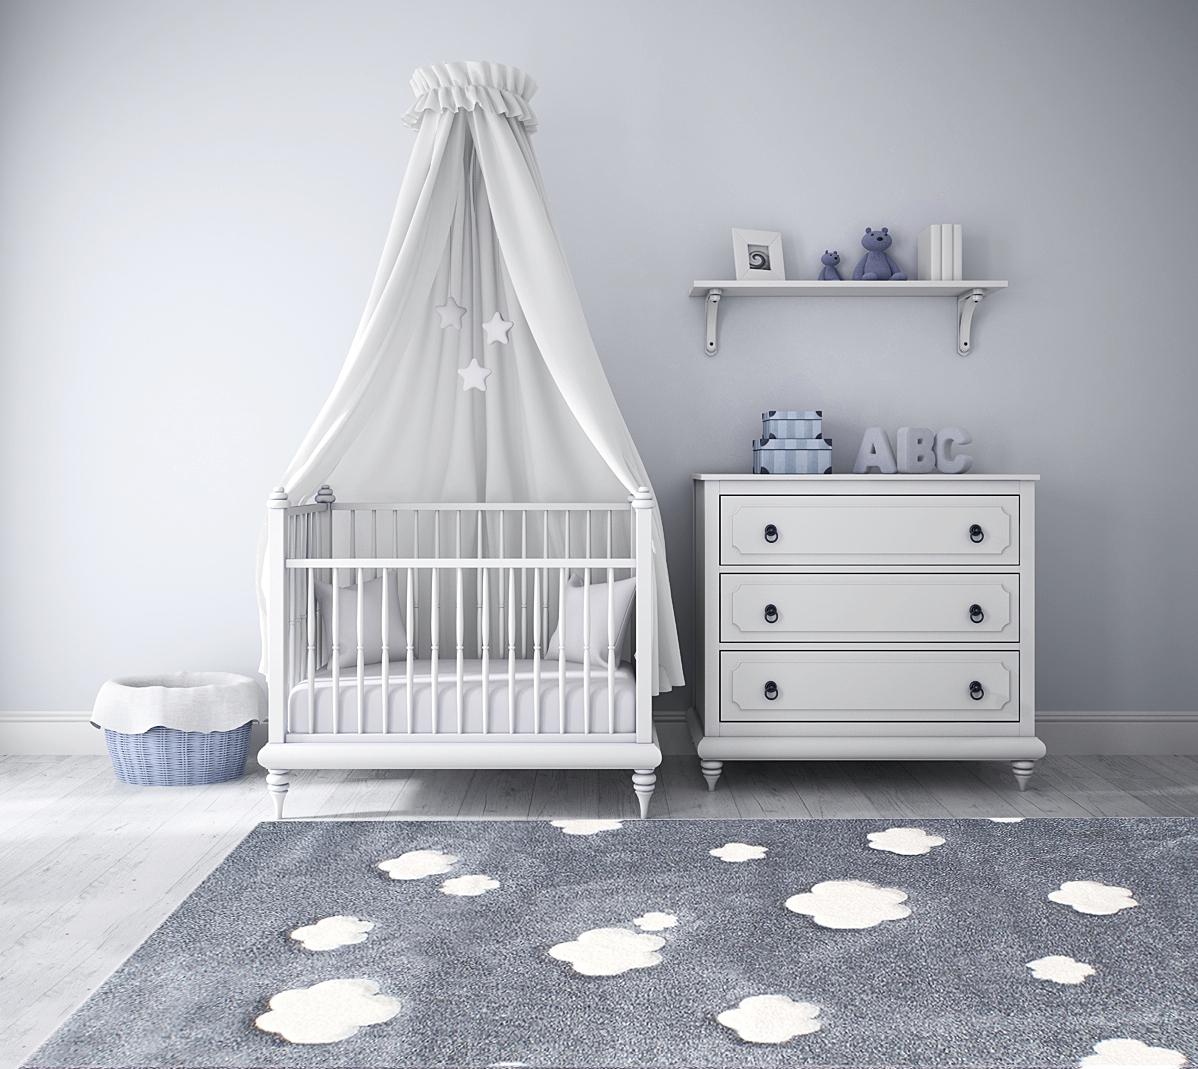 Full Size of Kinderzimmer Teppiche Teppich 120x180 160x230 Grau Wei Wolke Regal Weiß Regale Sofa Wohnzimmer Kinderzimmer Kinderzimmer Teppiche